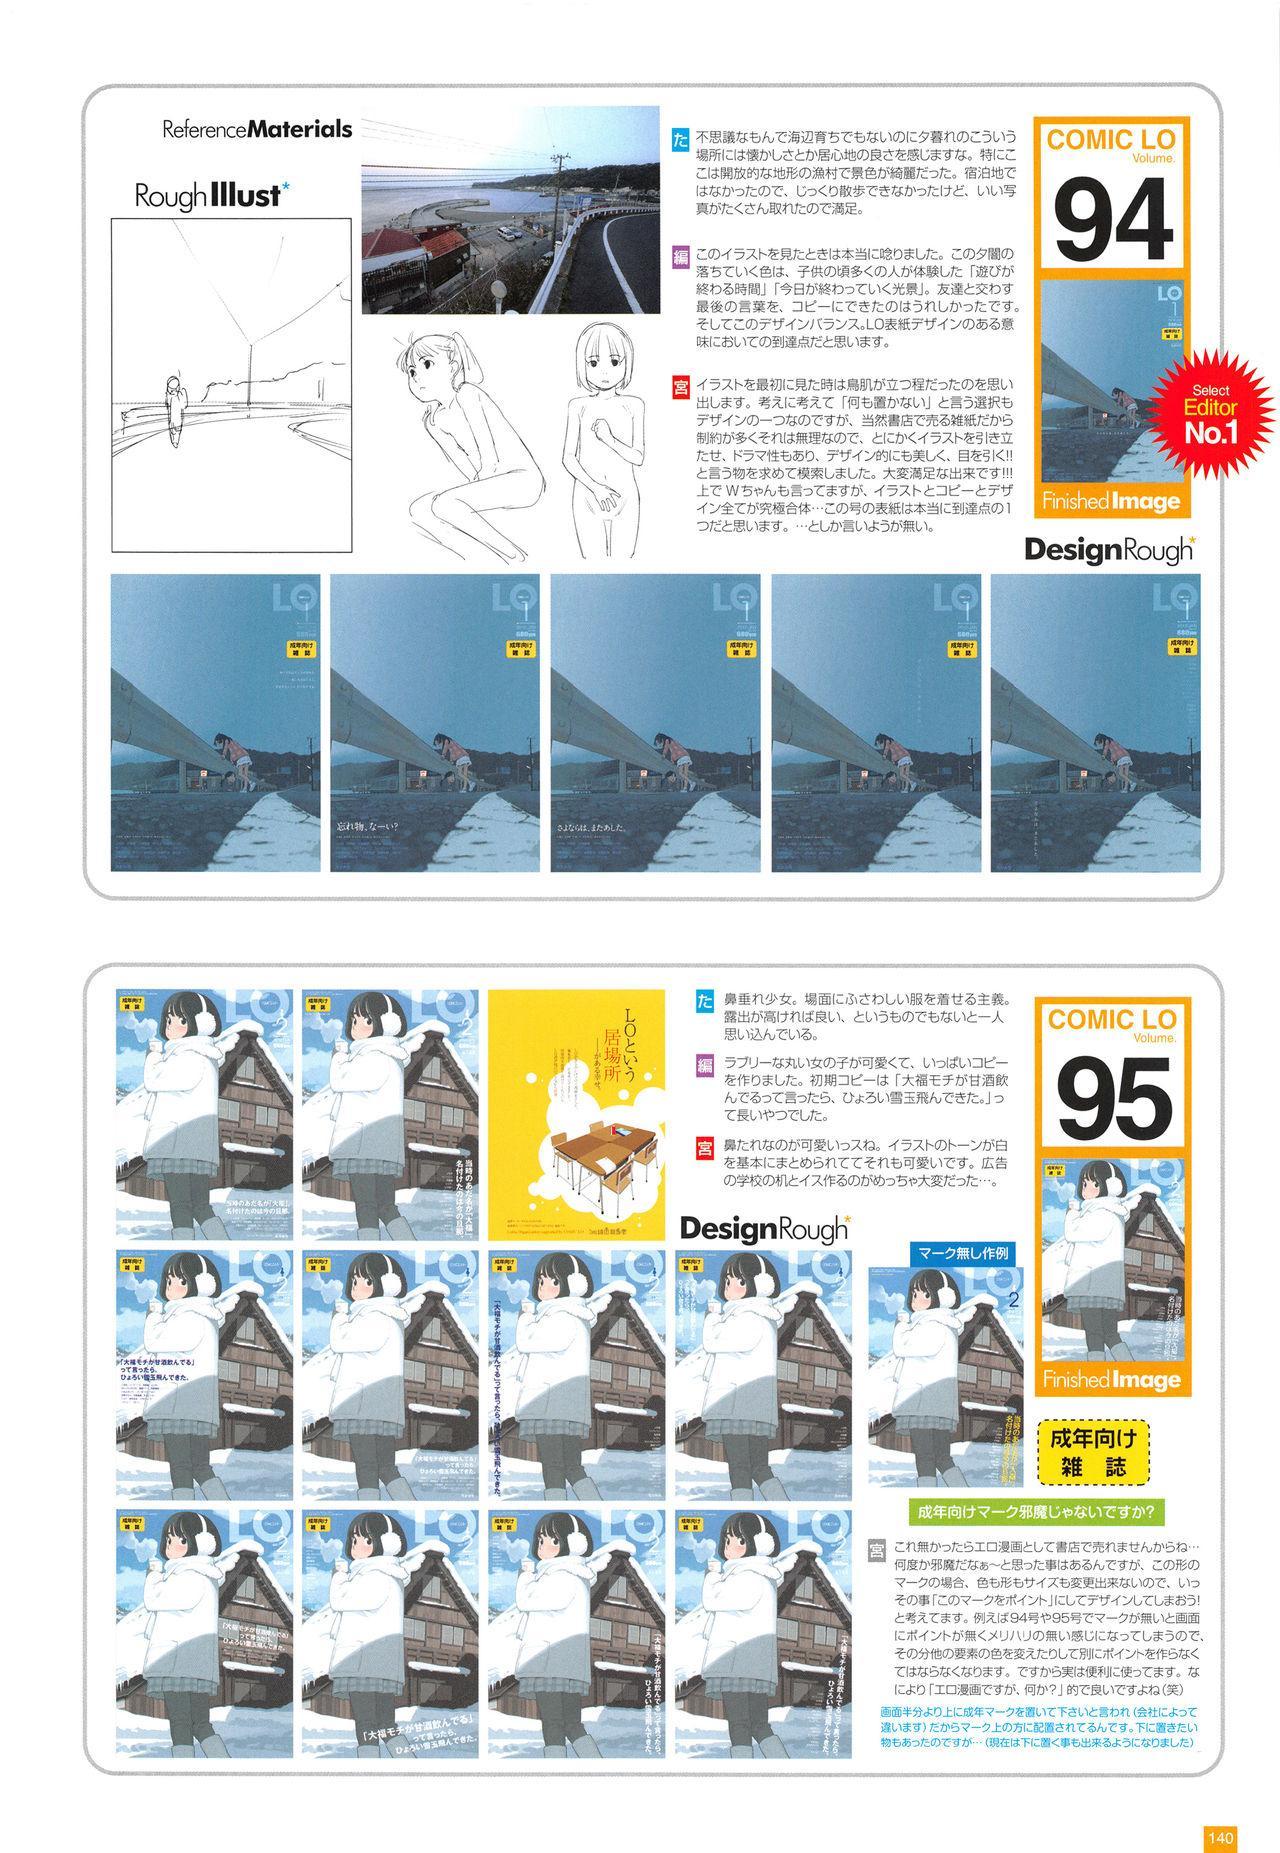 LO Artbook 2-A TAKAMICHI LOOP WORKS 142